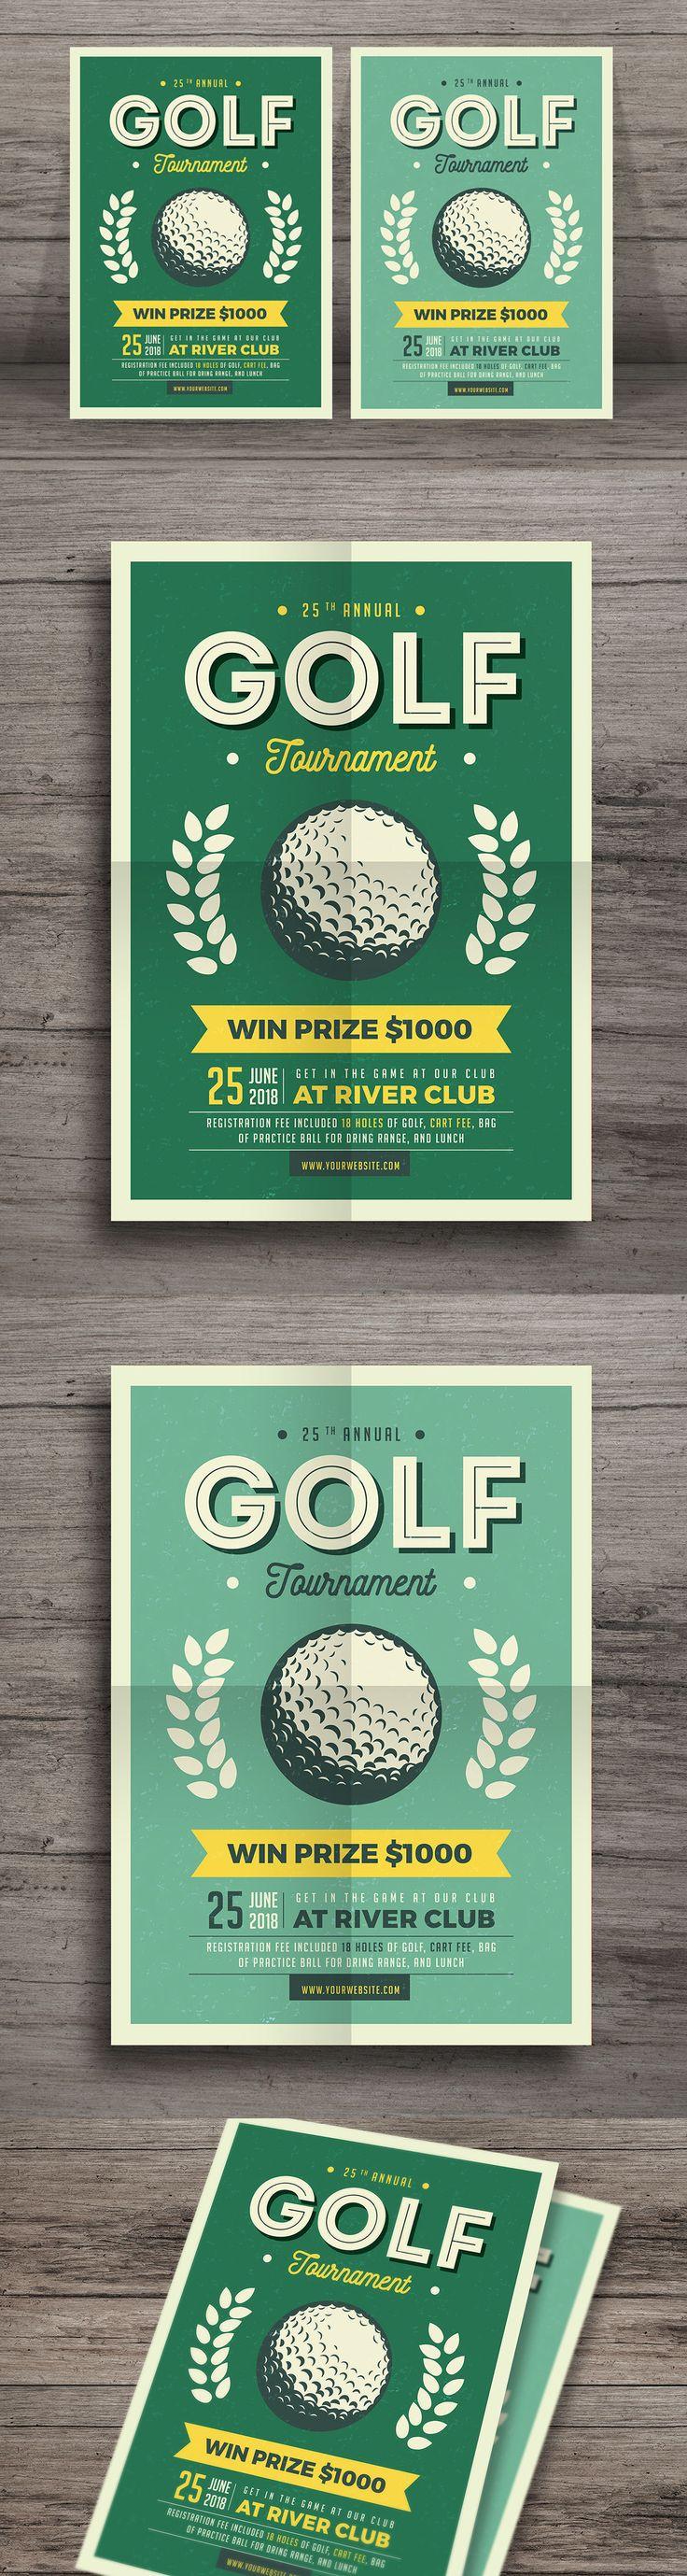 Vintage Golf Flyer Template AI, PSD